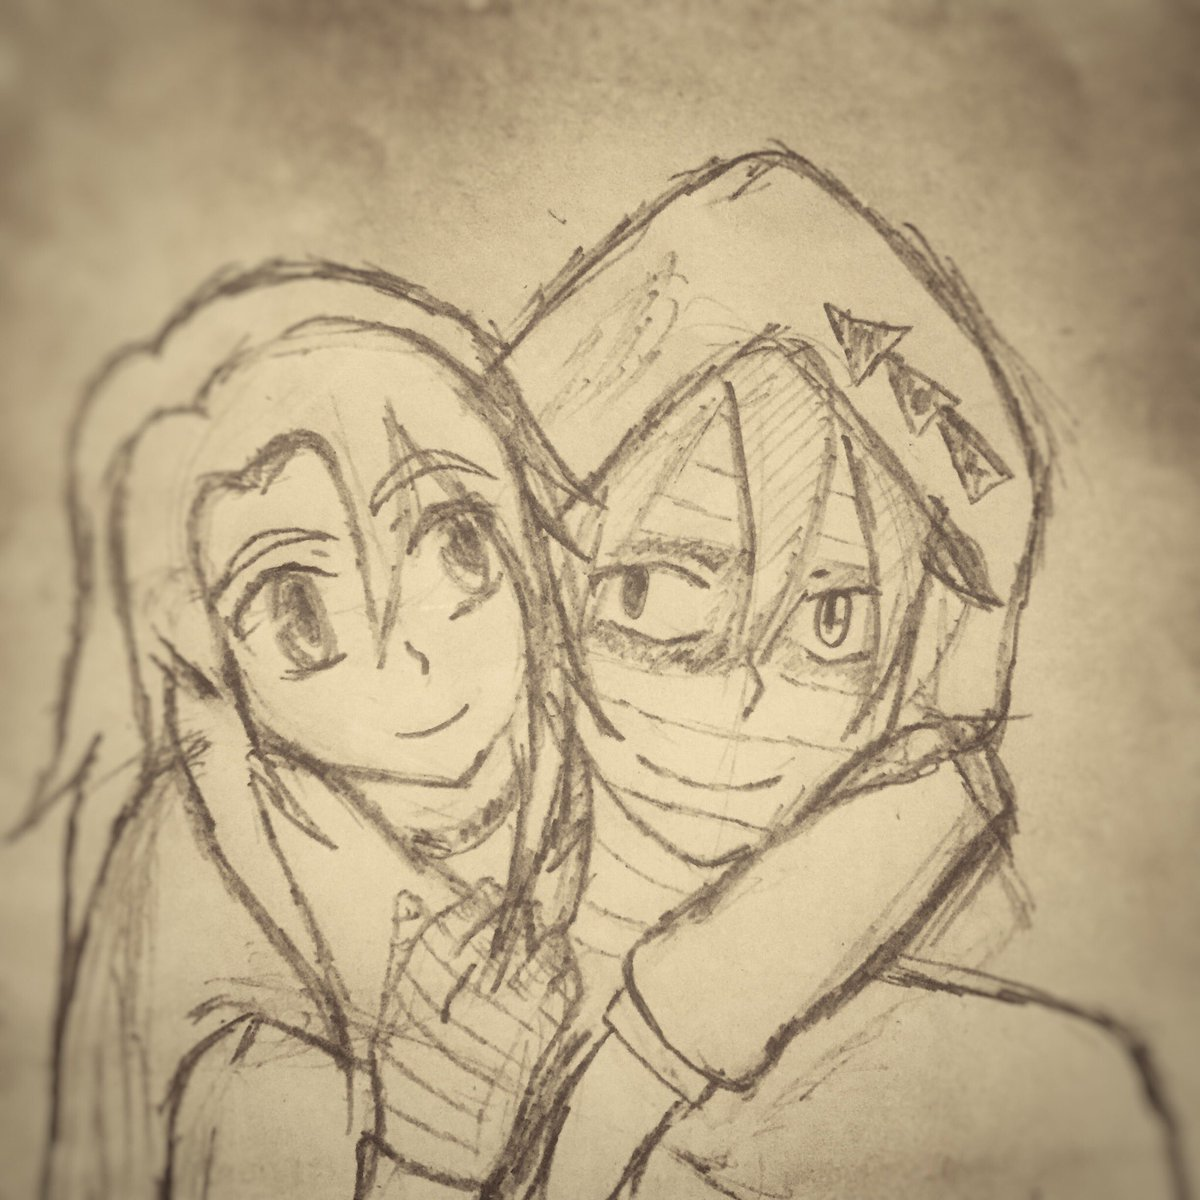 Ok, now I messed up the drawing. 😫😖  #zackxray #satsurikunotenshi #ザックレイ #drawing #殺戮の天使